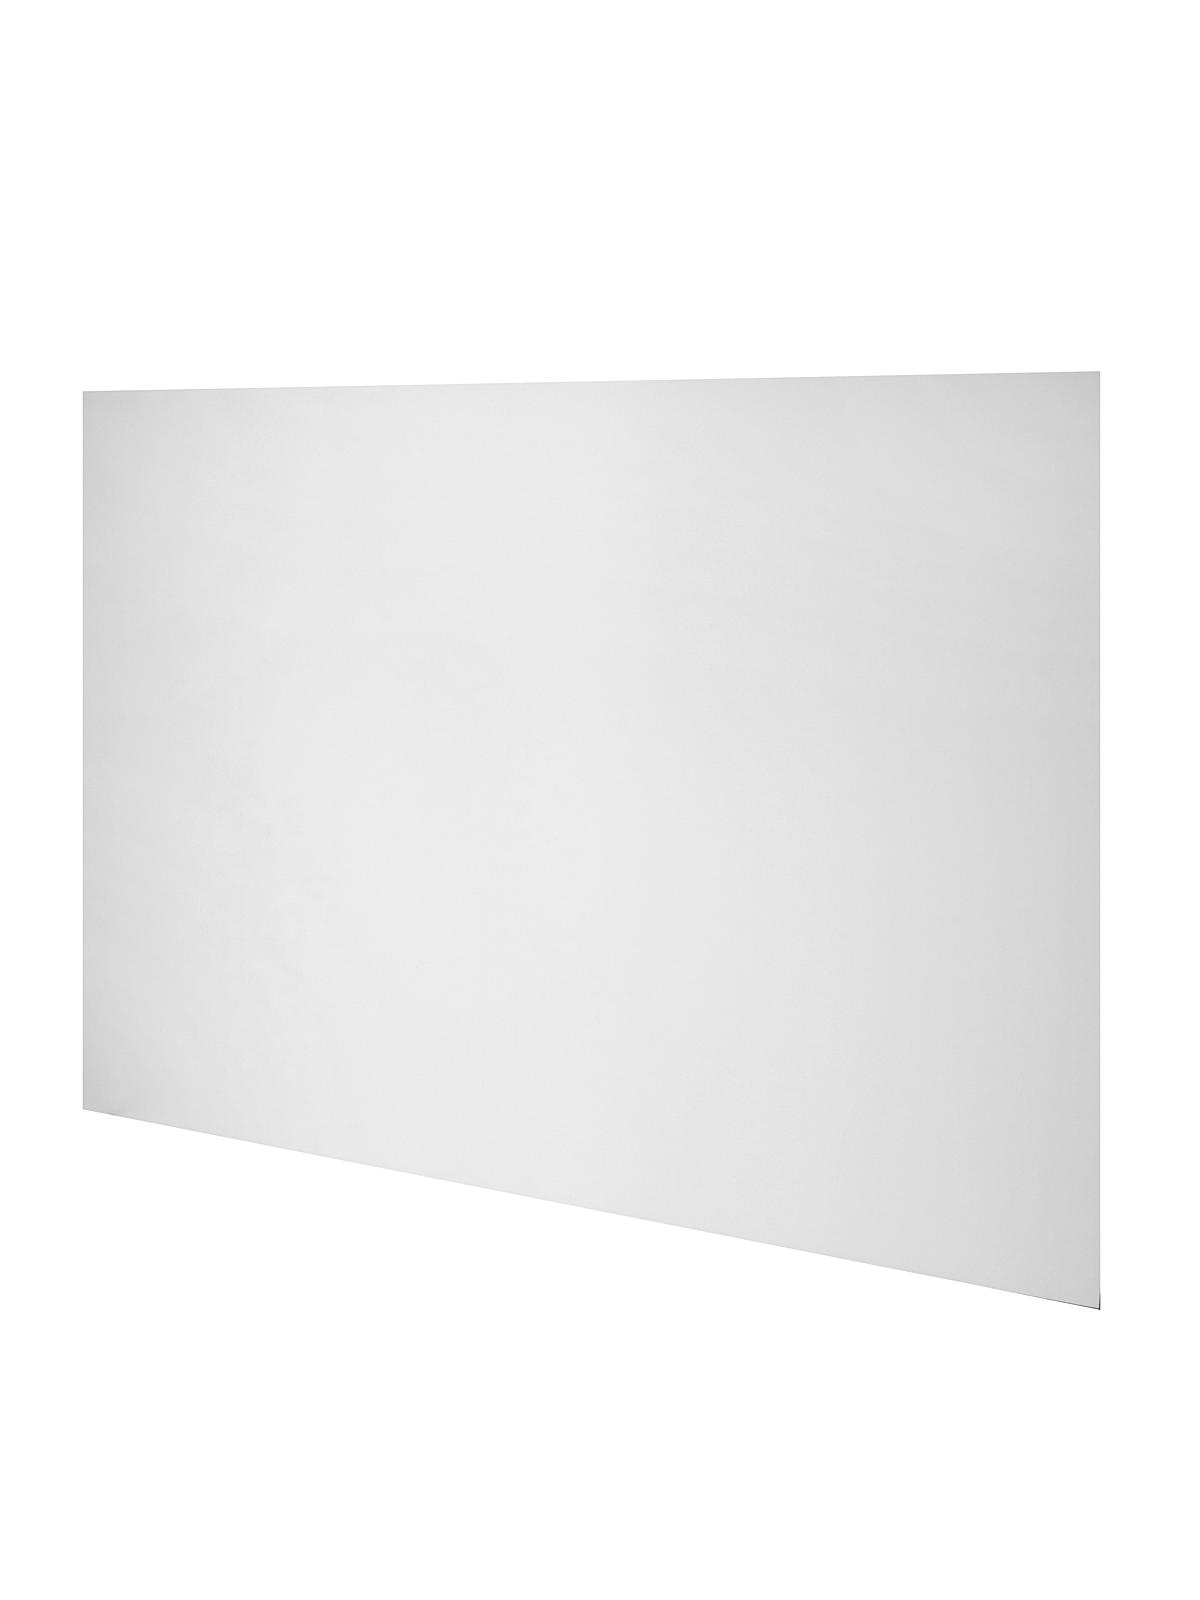 Fome-cor Board White 3 16 In. X 40 In. X 60 In. Each